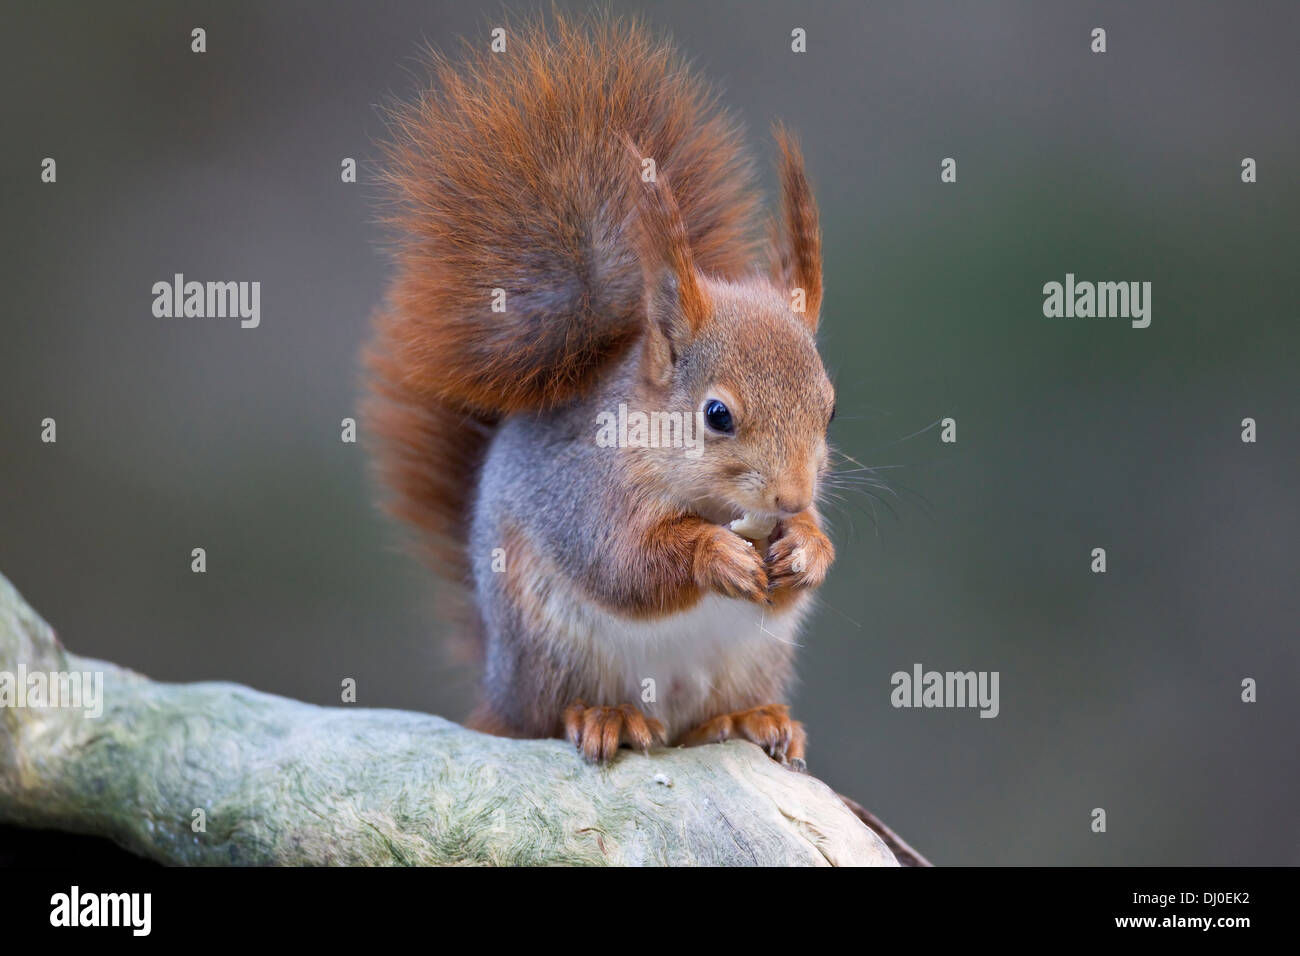 Cute Red Squirrel Sciurus vulgaris eating a hazel nut on a tree branch Stock Photo